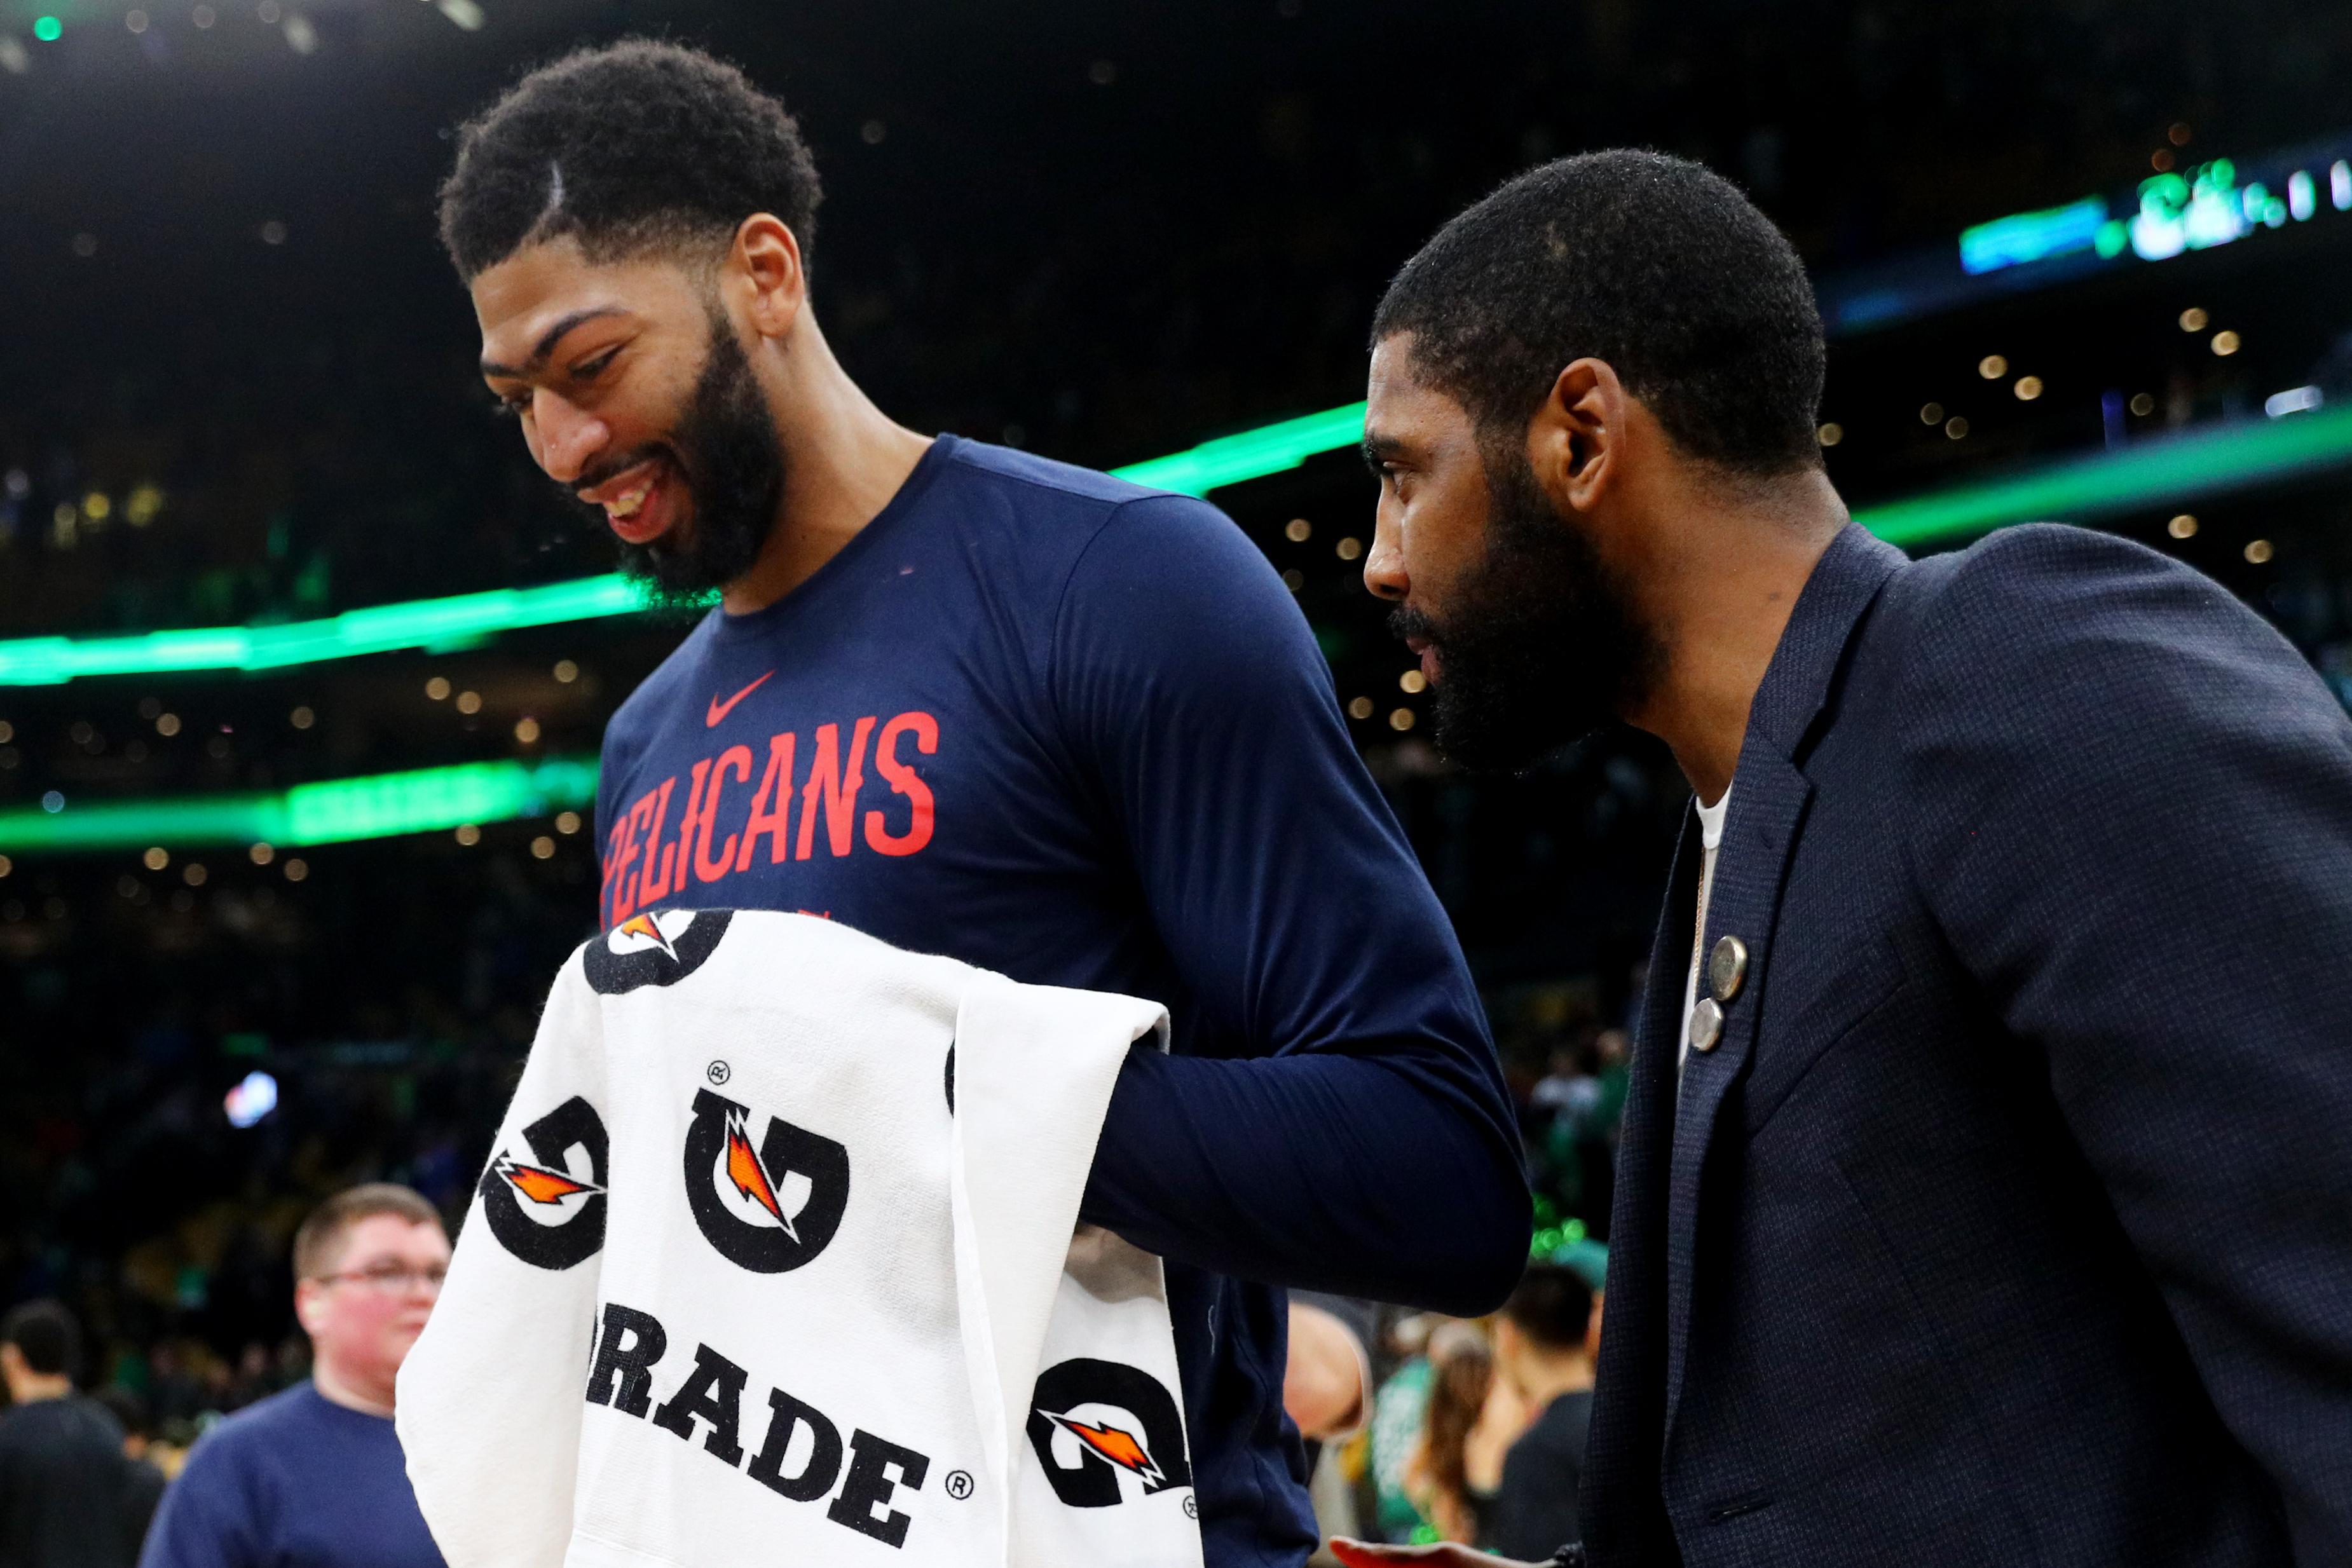 85d4f0c58f0c LeBron James talked NBA trade deadline ahead of matchup vs. Celtics - The  Boston Globe